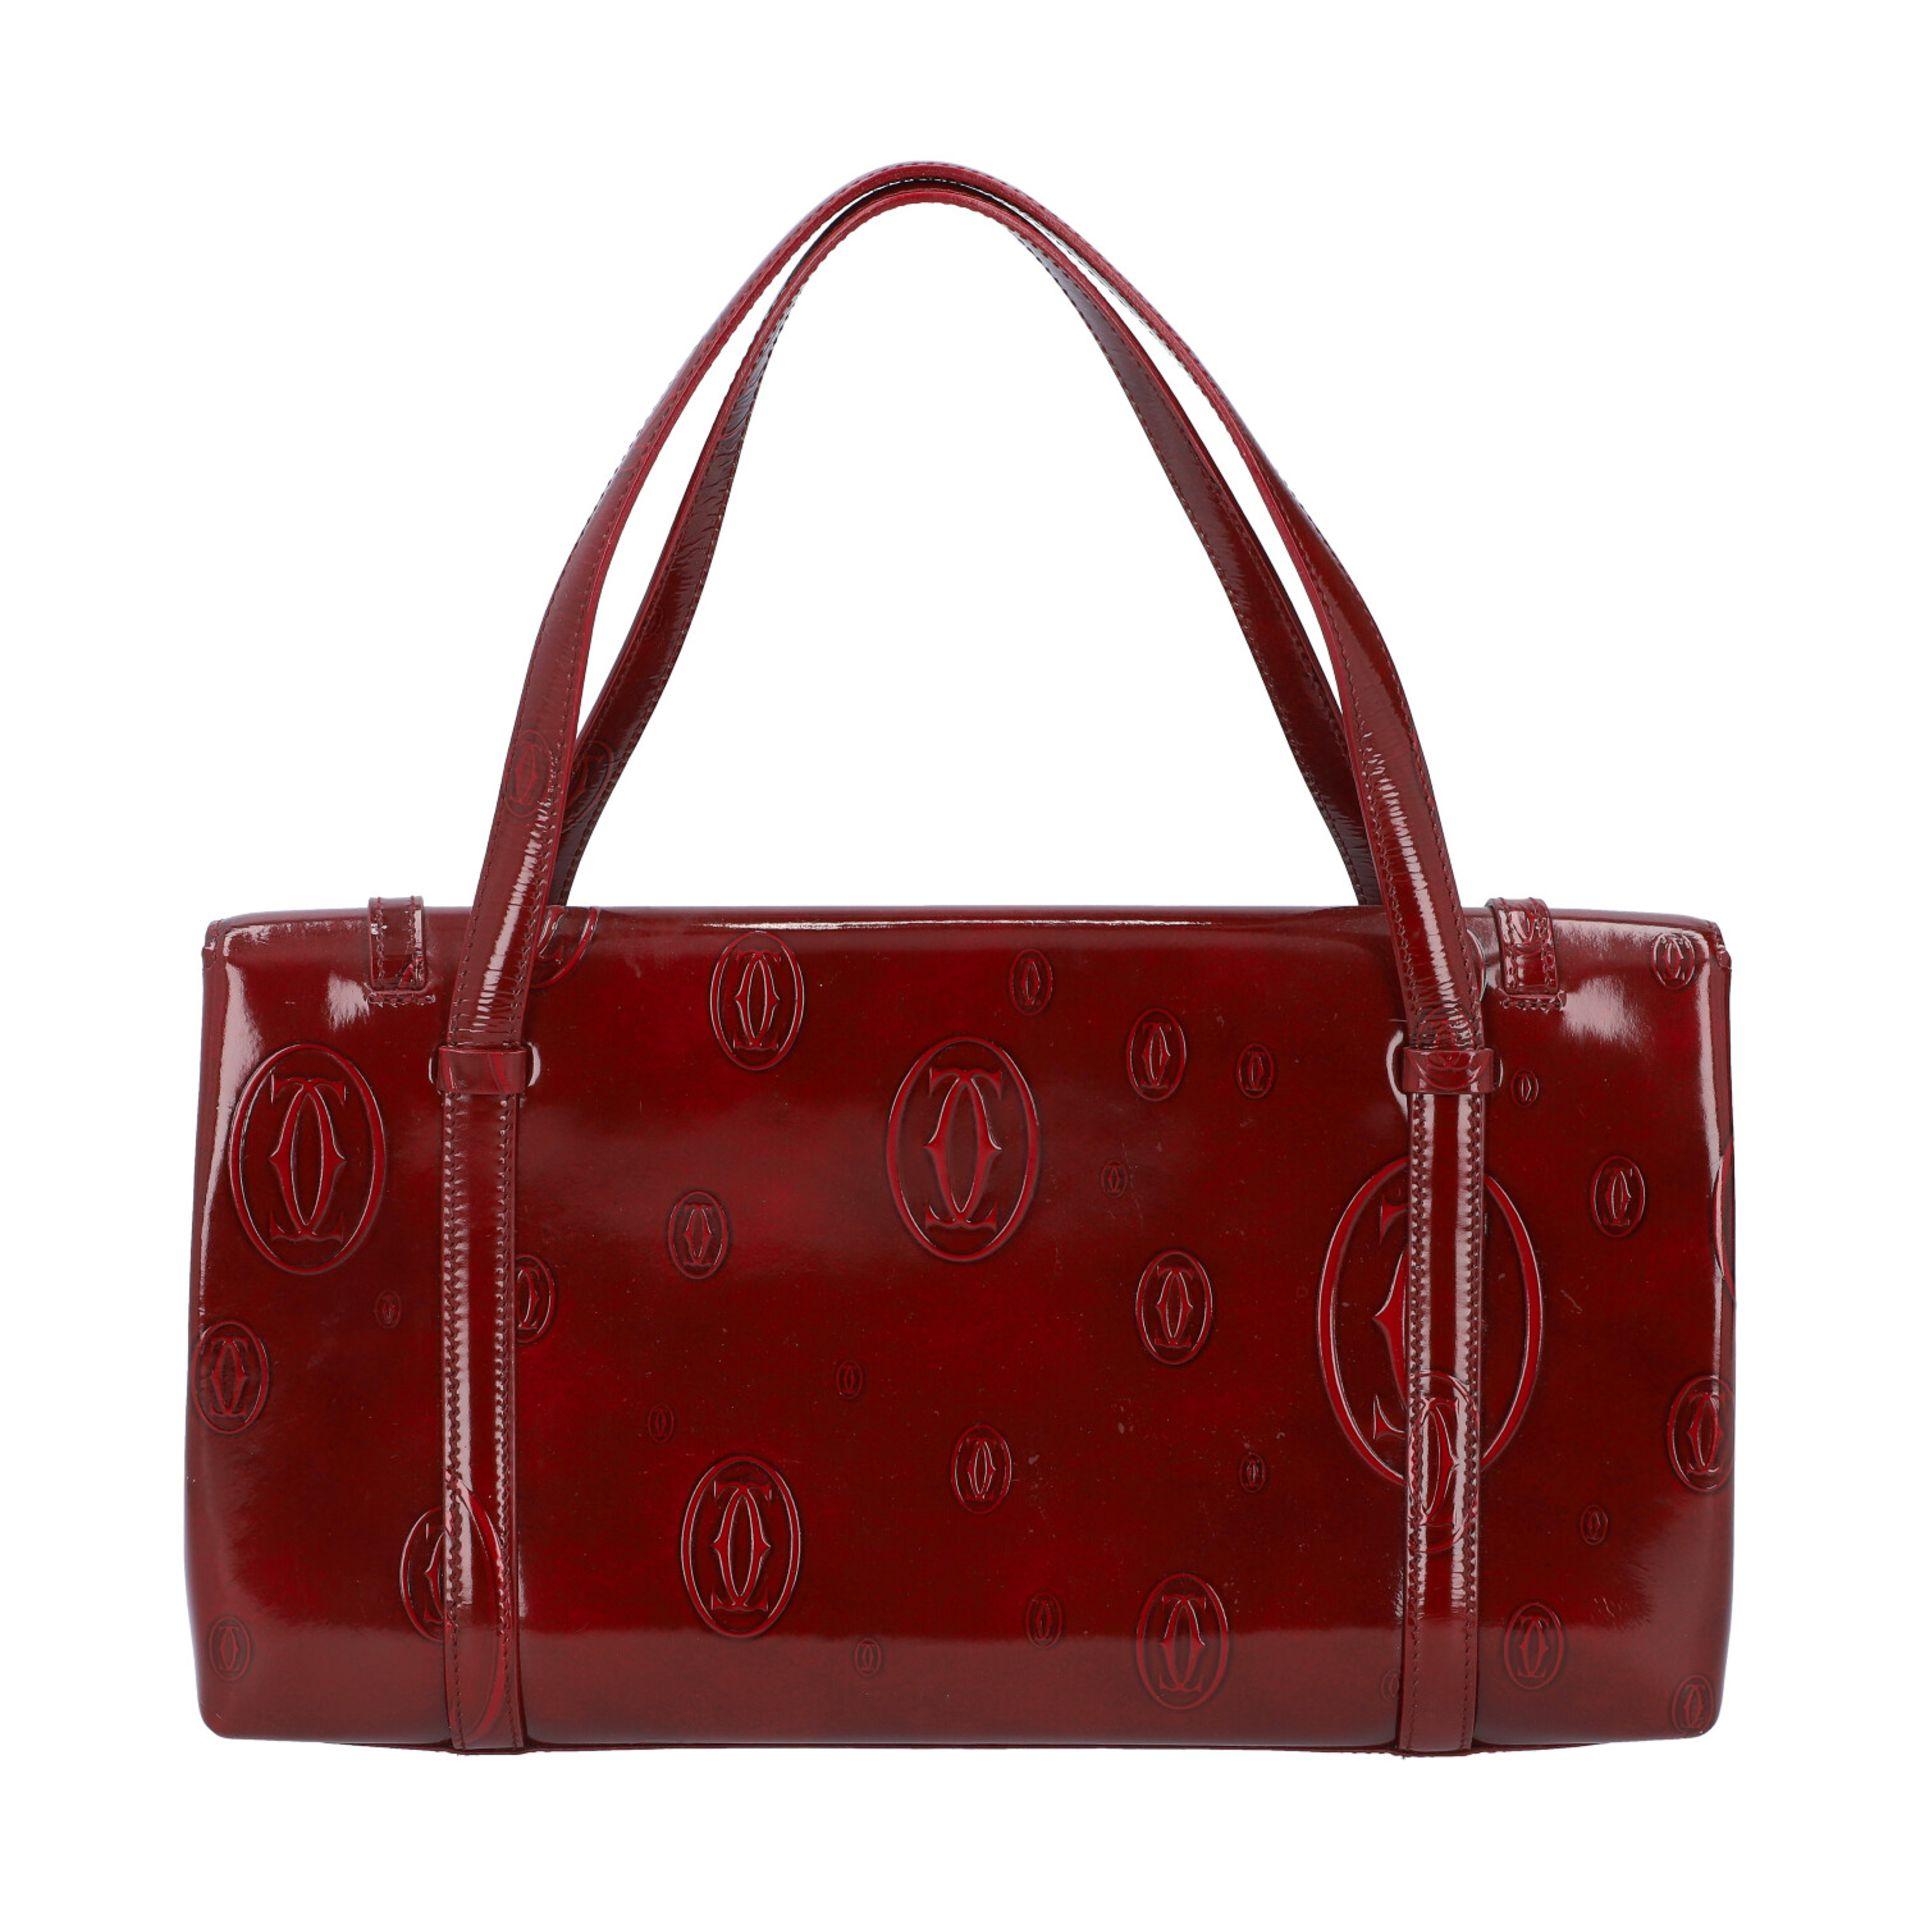 "CARTIER VINTAGE Handtasche ""HAPPY BIRTHDAY"". - Image 4 of 8"